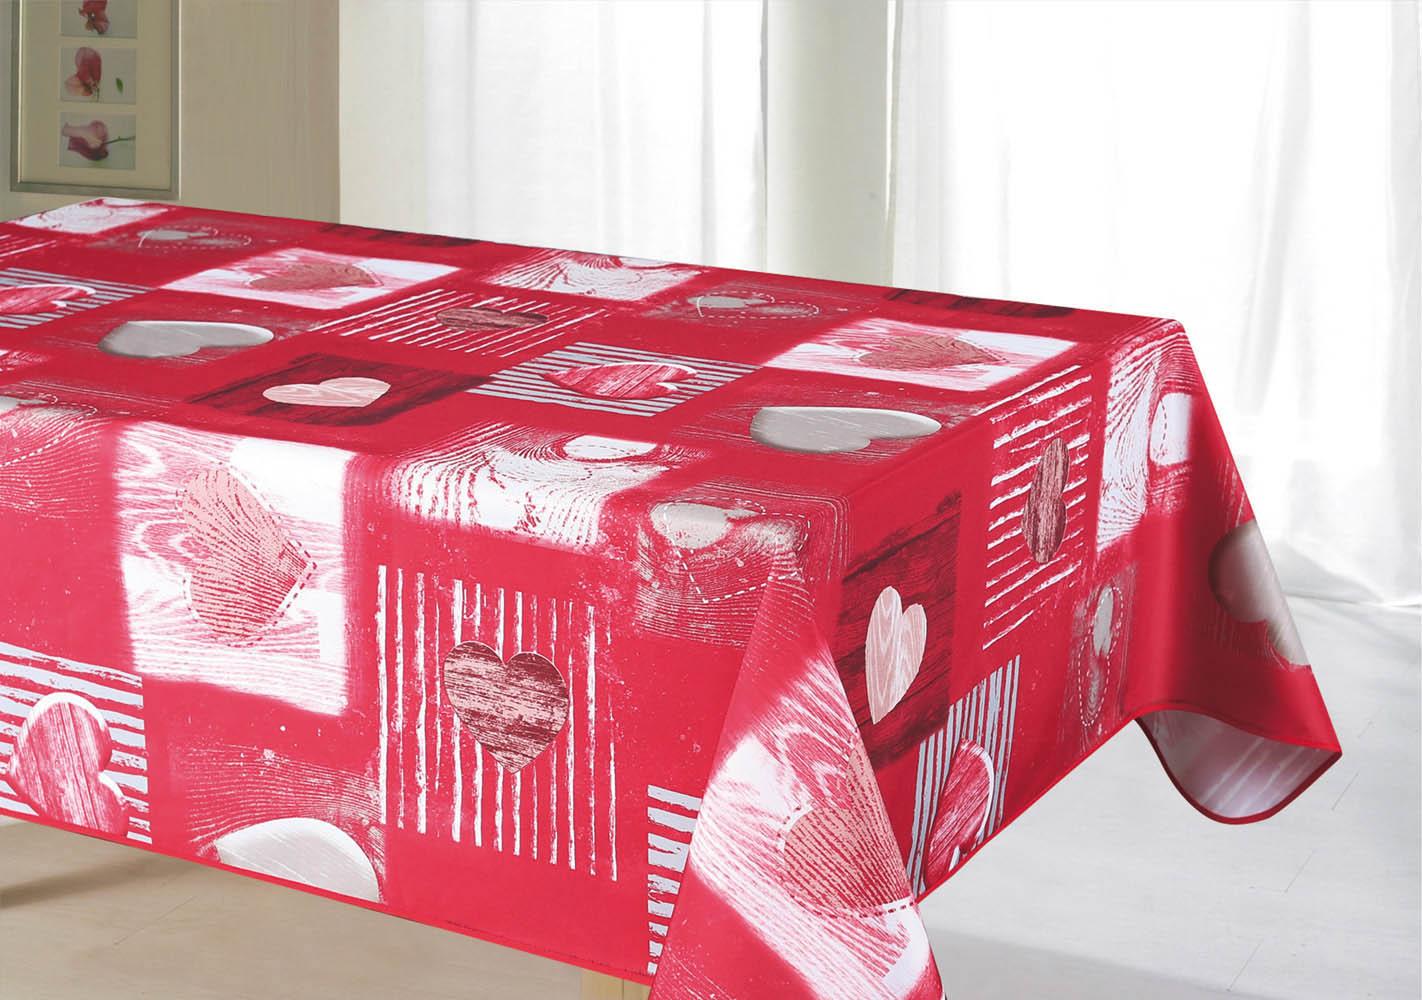 Скатерти и салфетки Подушкино Скатерть Silk  (140х180 см) скатерть вилина every day 140 180 см